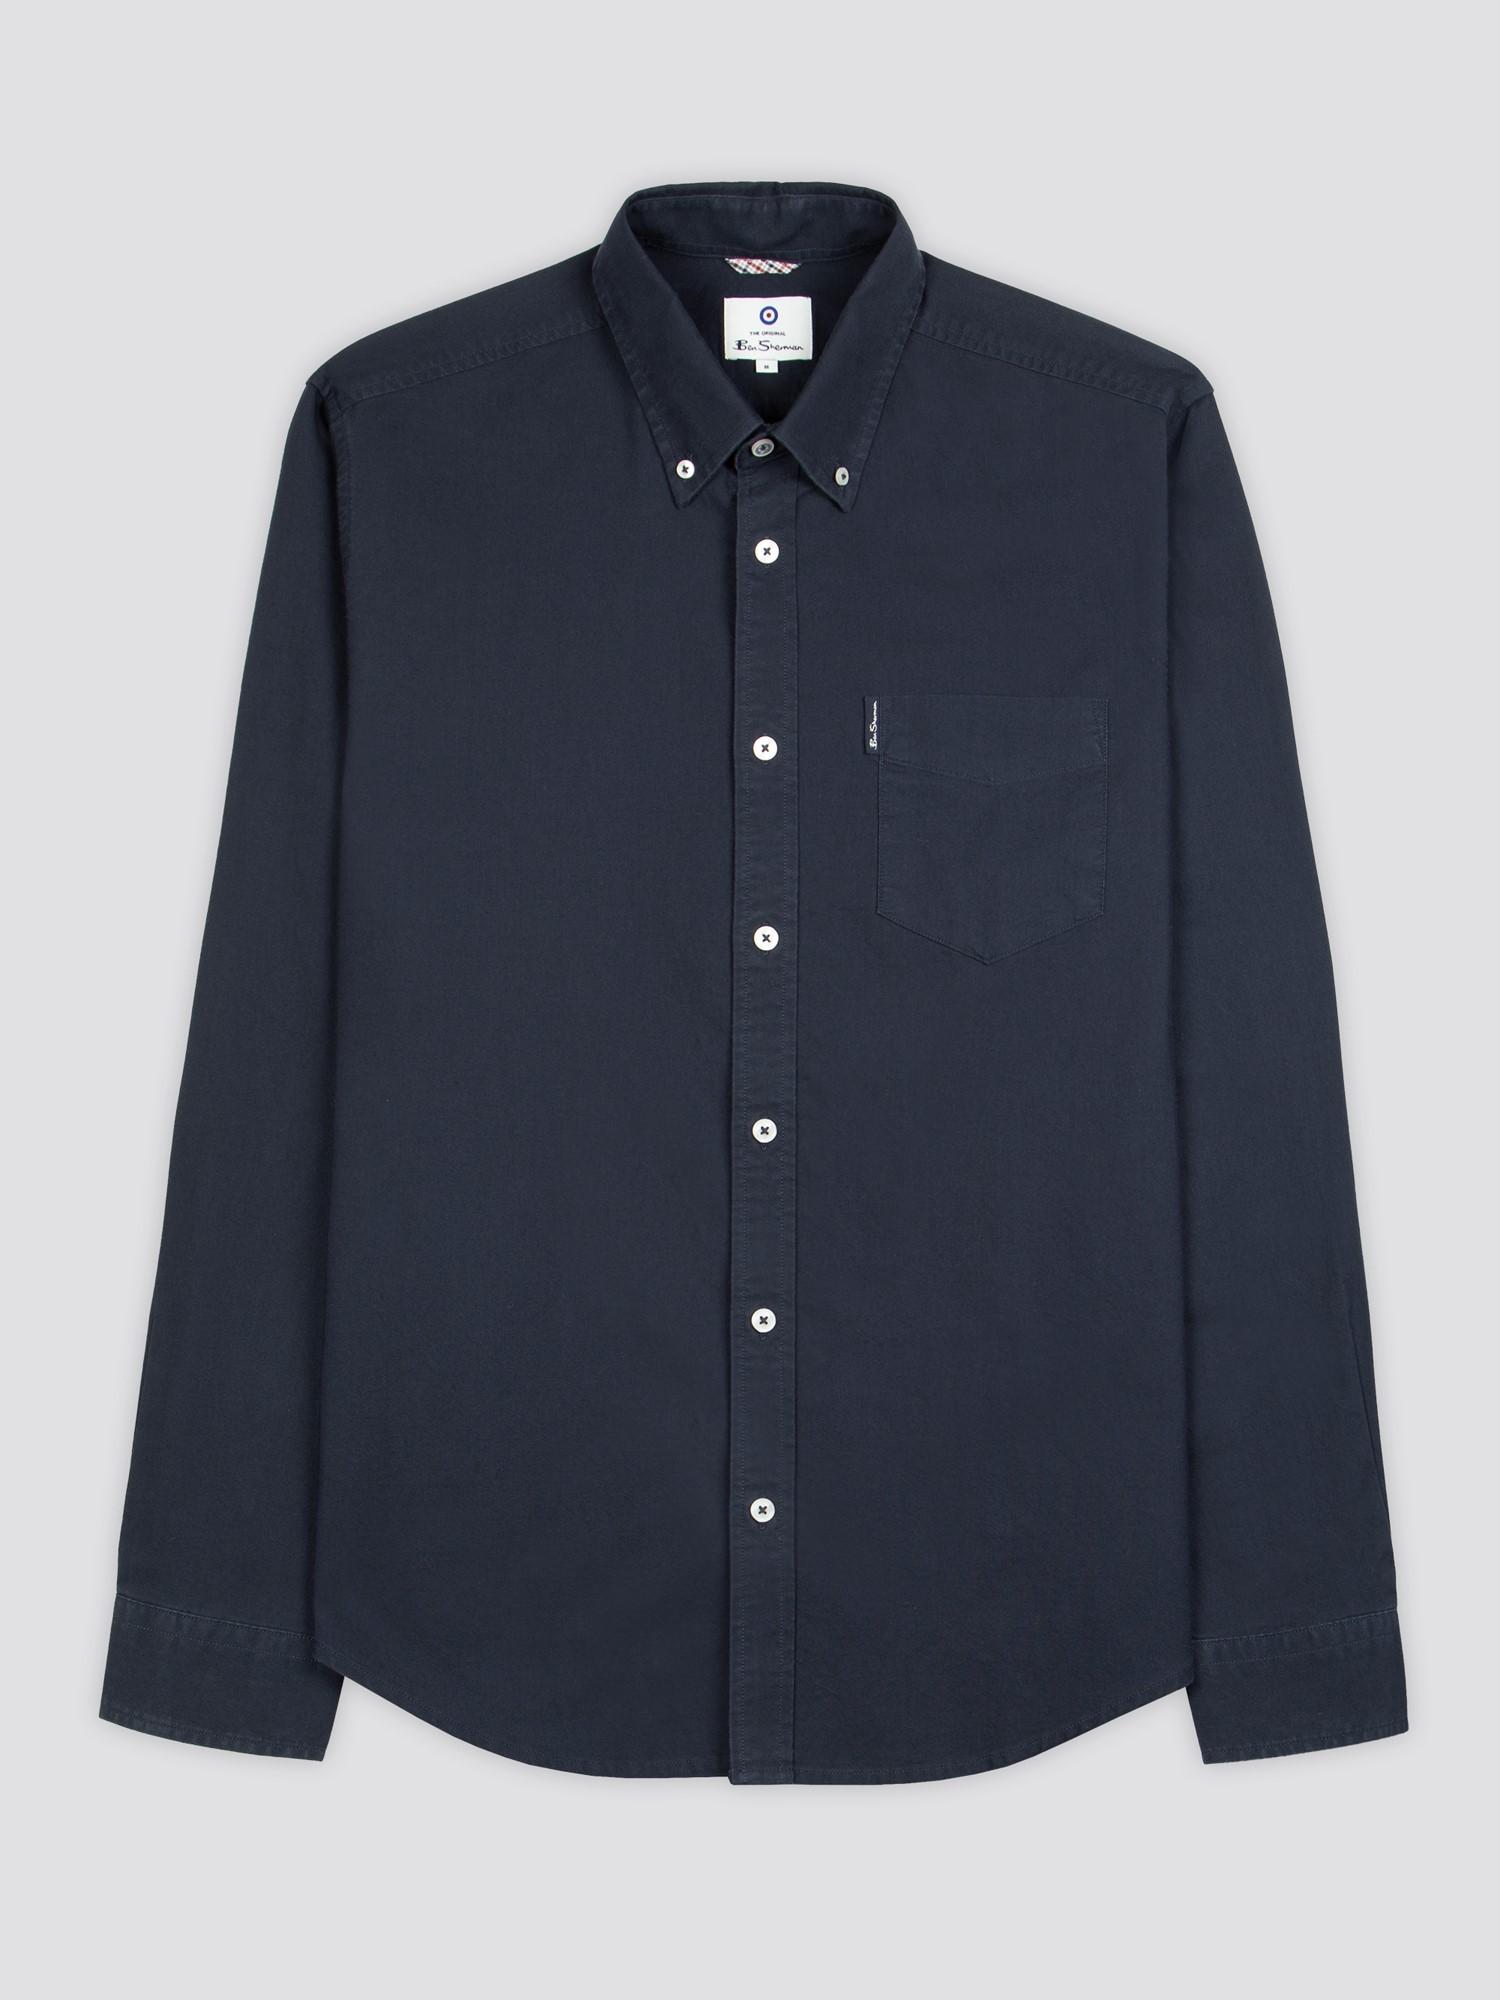 Navy Signature Button Down Oxford Shirt